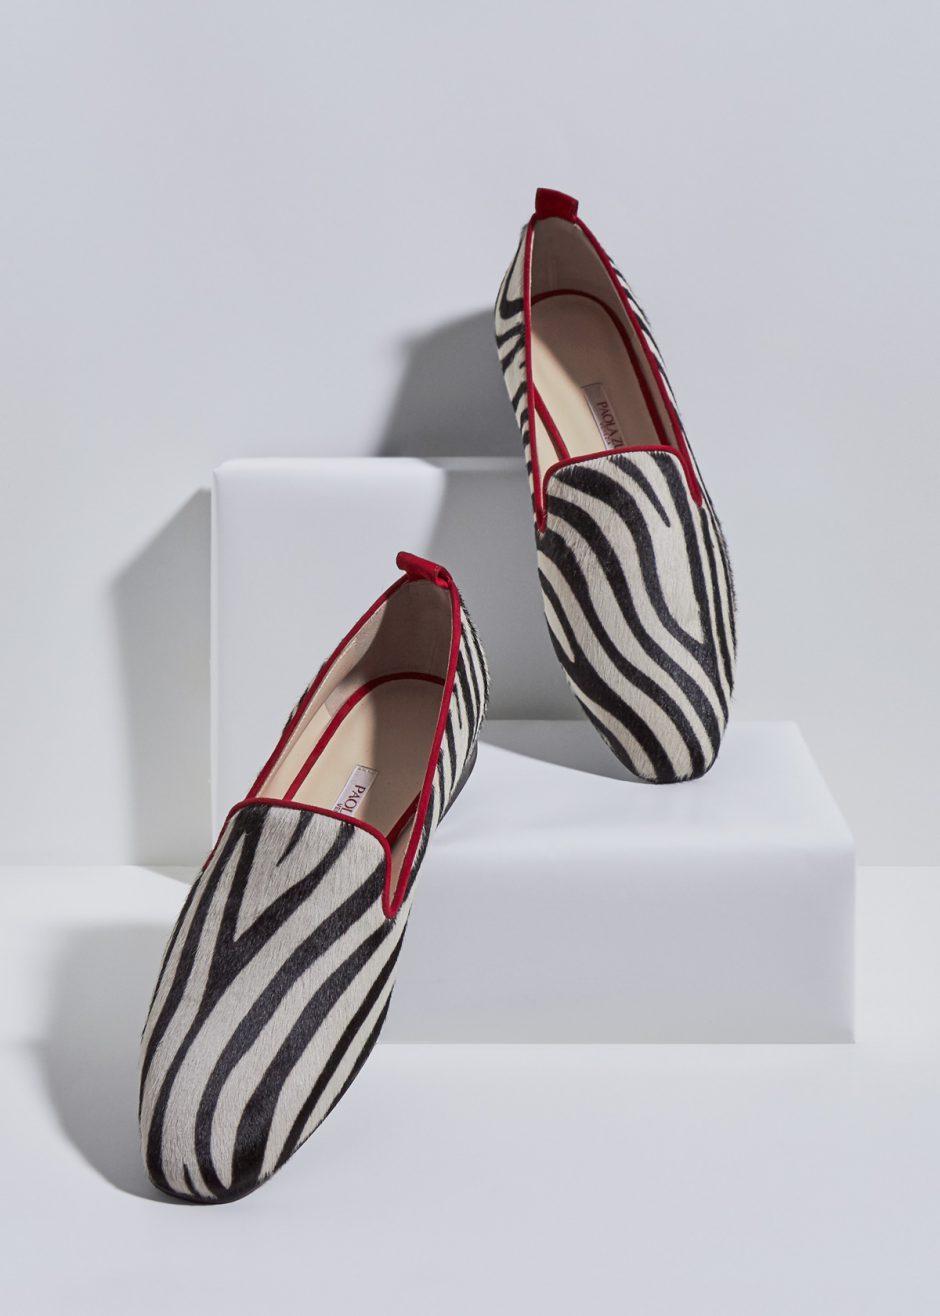 Vicky – Ballerina in suede in cavallino zebrato rosso